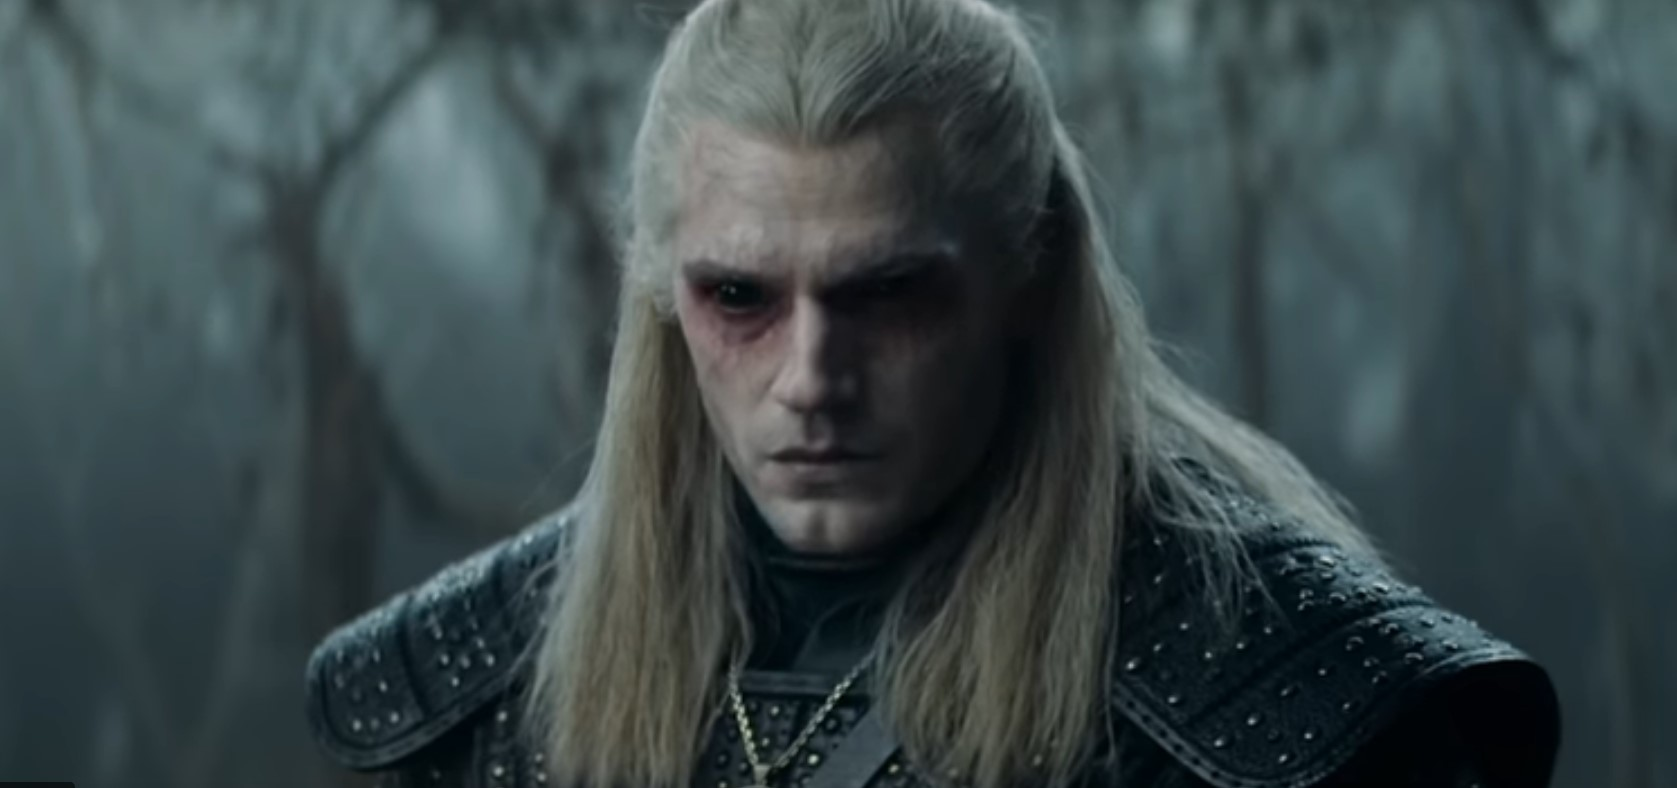 Lanzan el primer teaser de The Witcher, la serie más esperada de Netflix